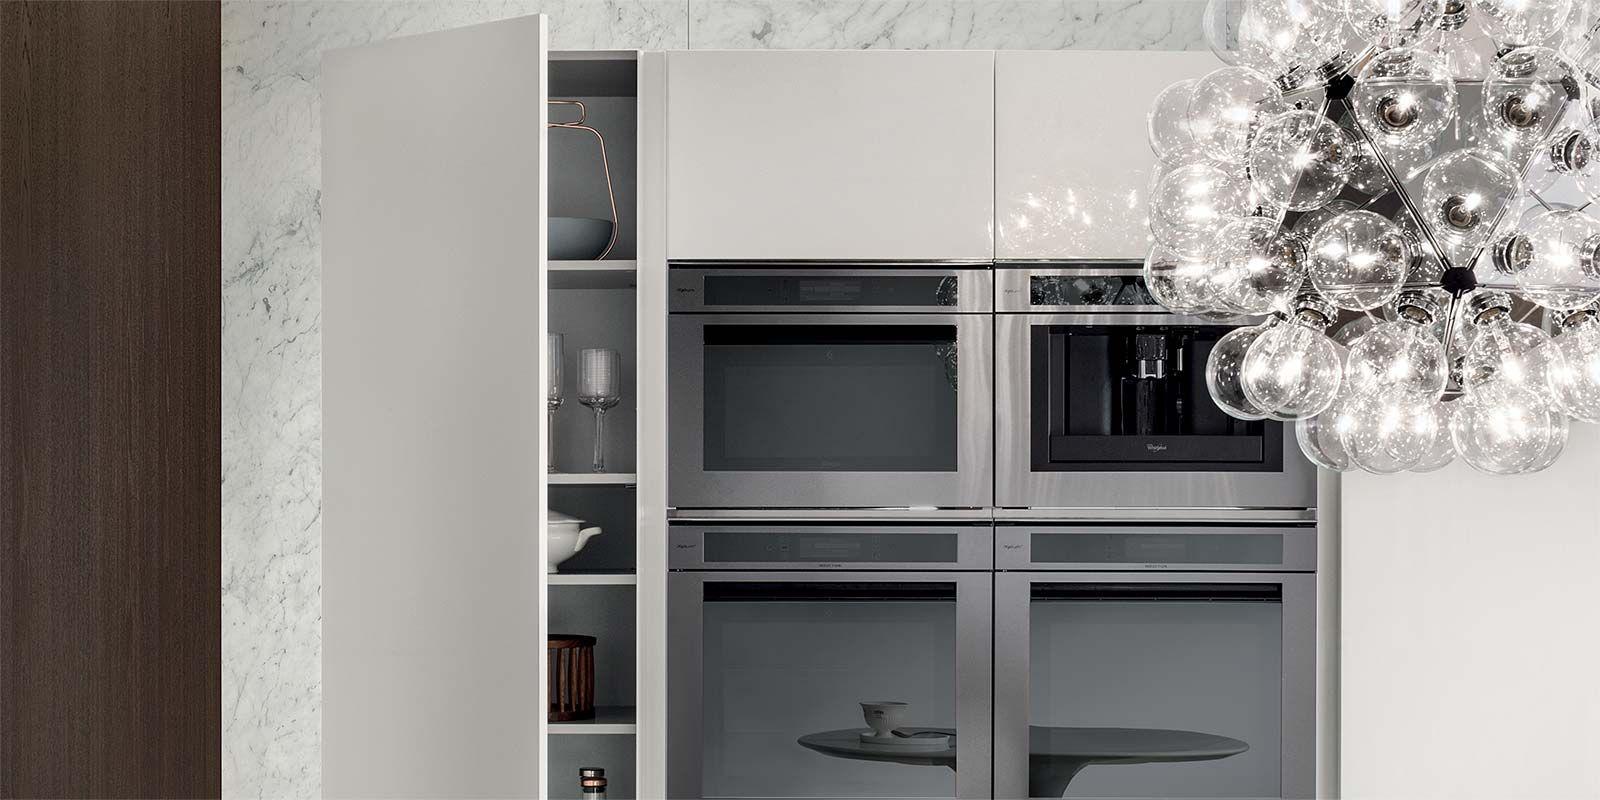 Cucine One - Cucine Moderne di Design - Ernestomeda | Arredo vintage ...